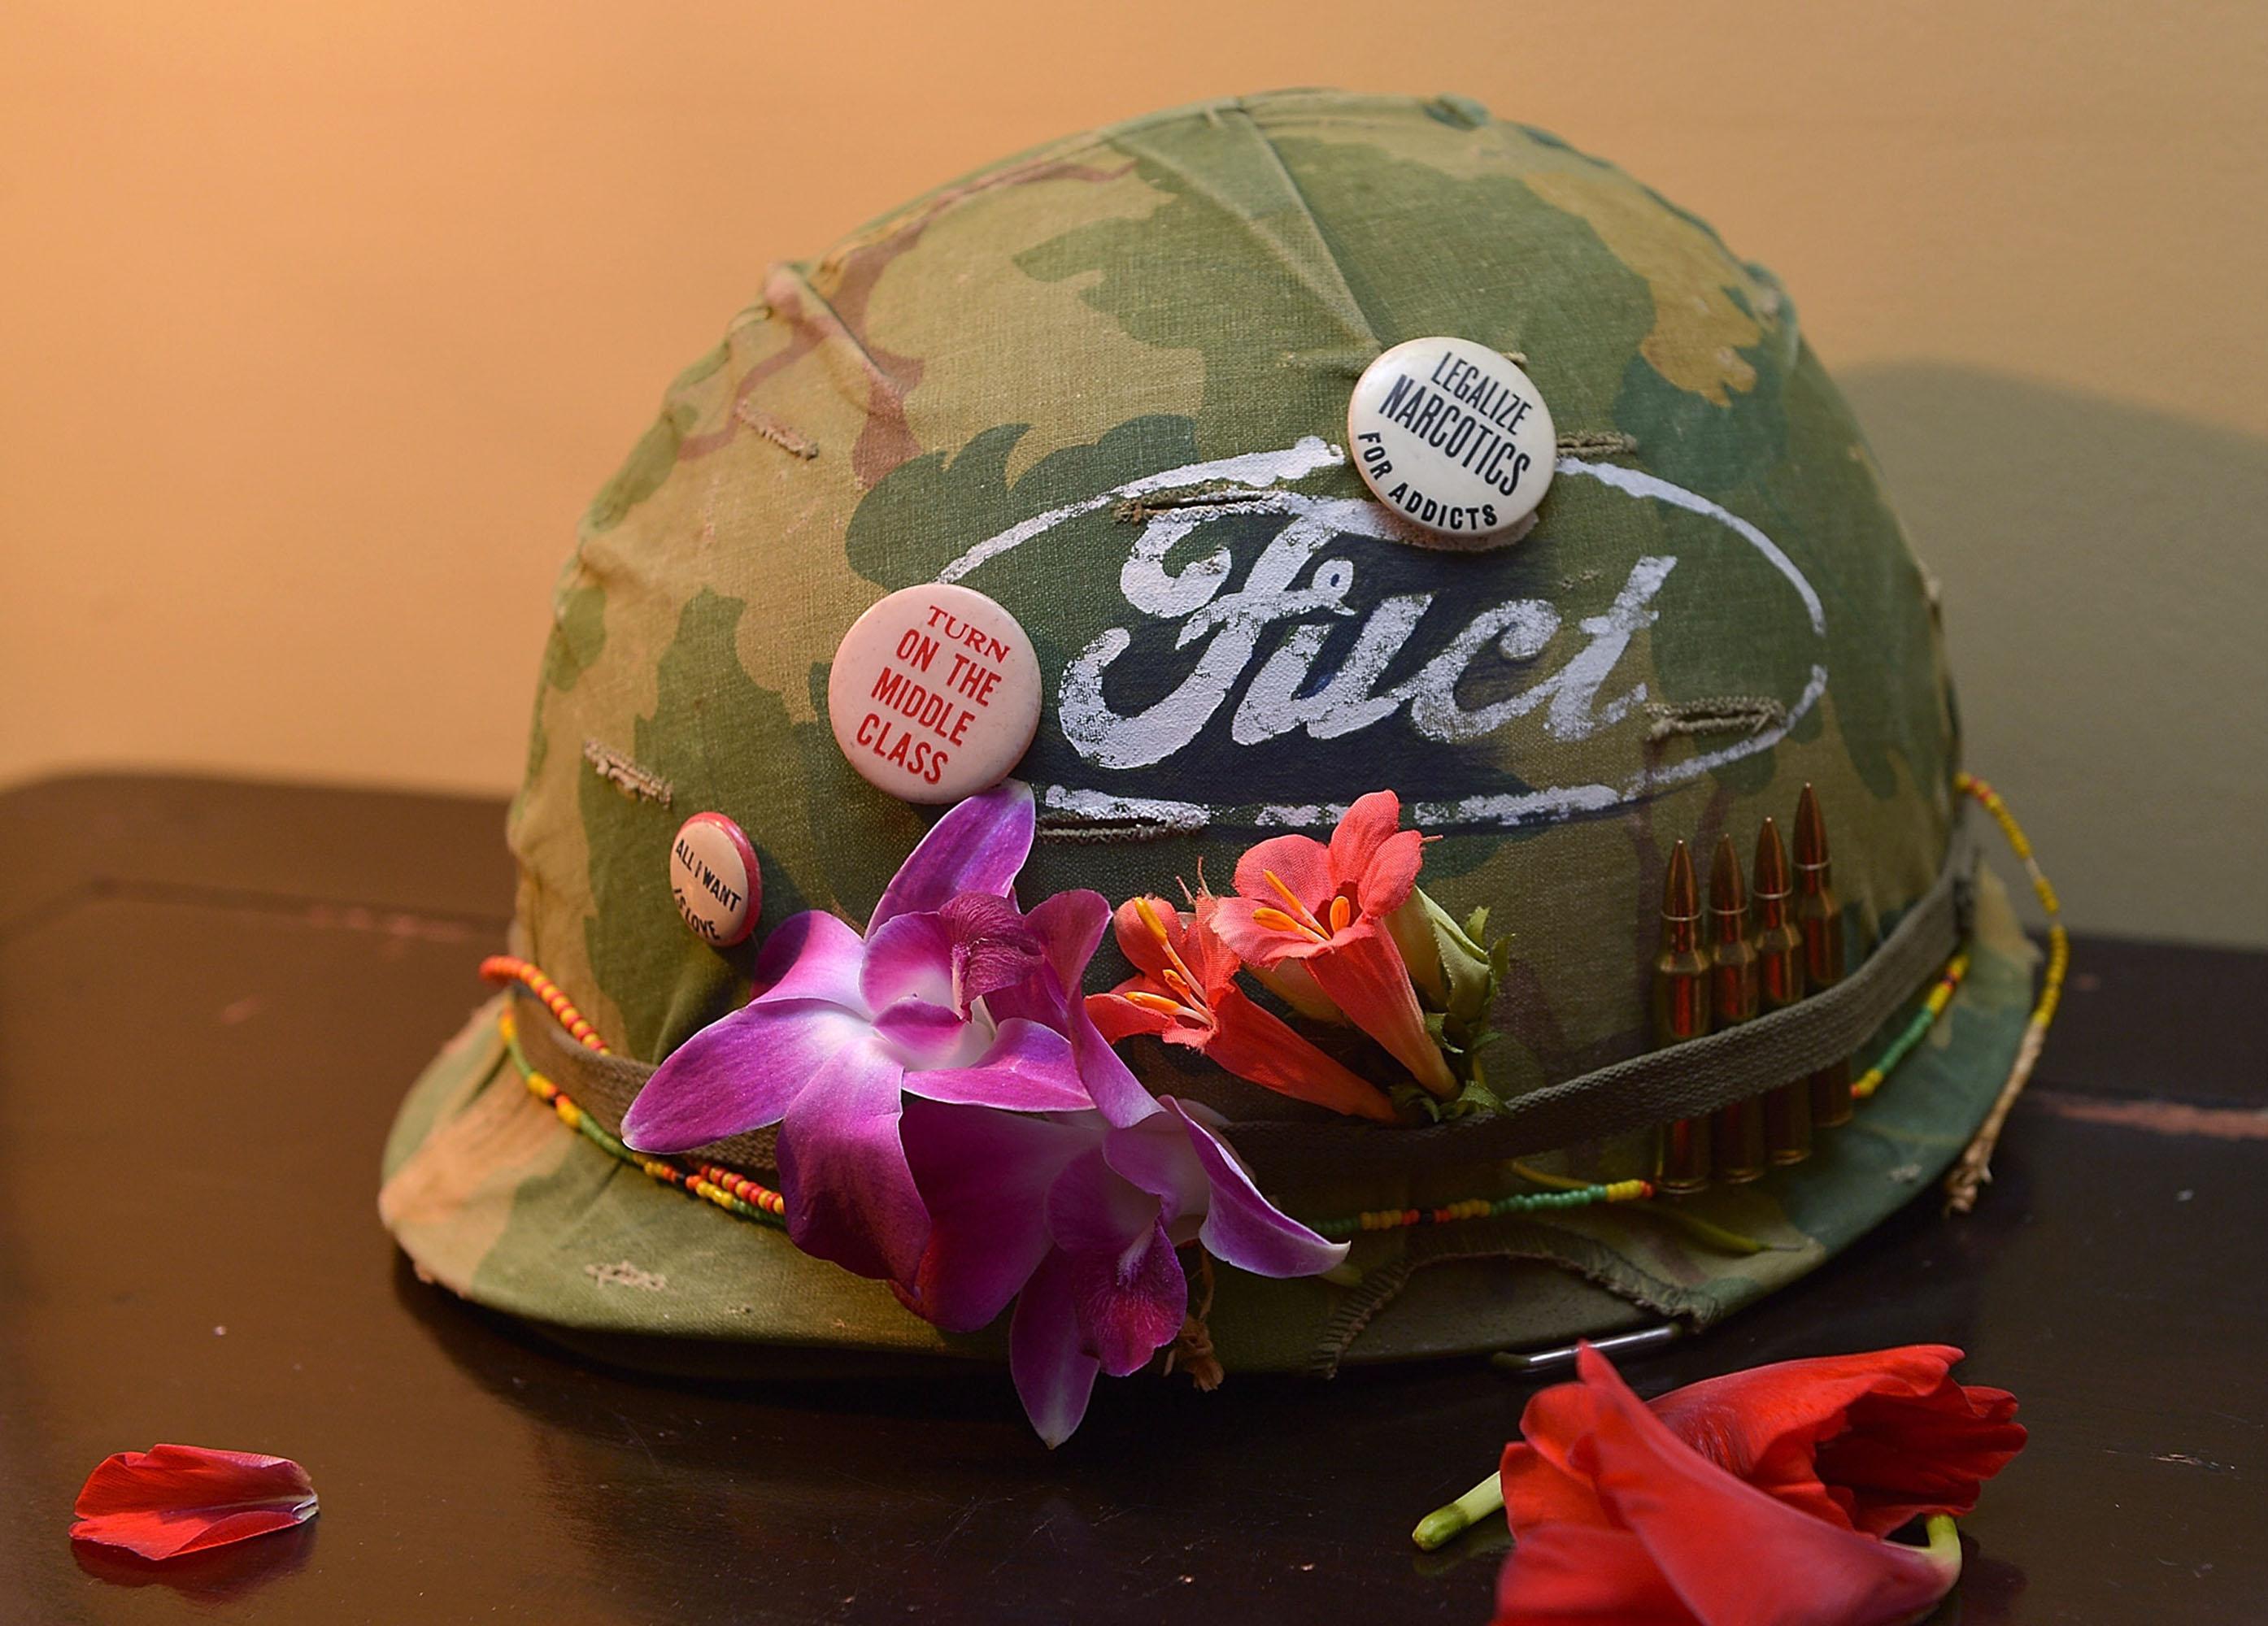 FUCT' Clothing Line Name Tests Supreme Court on Trademark